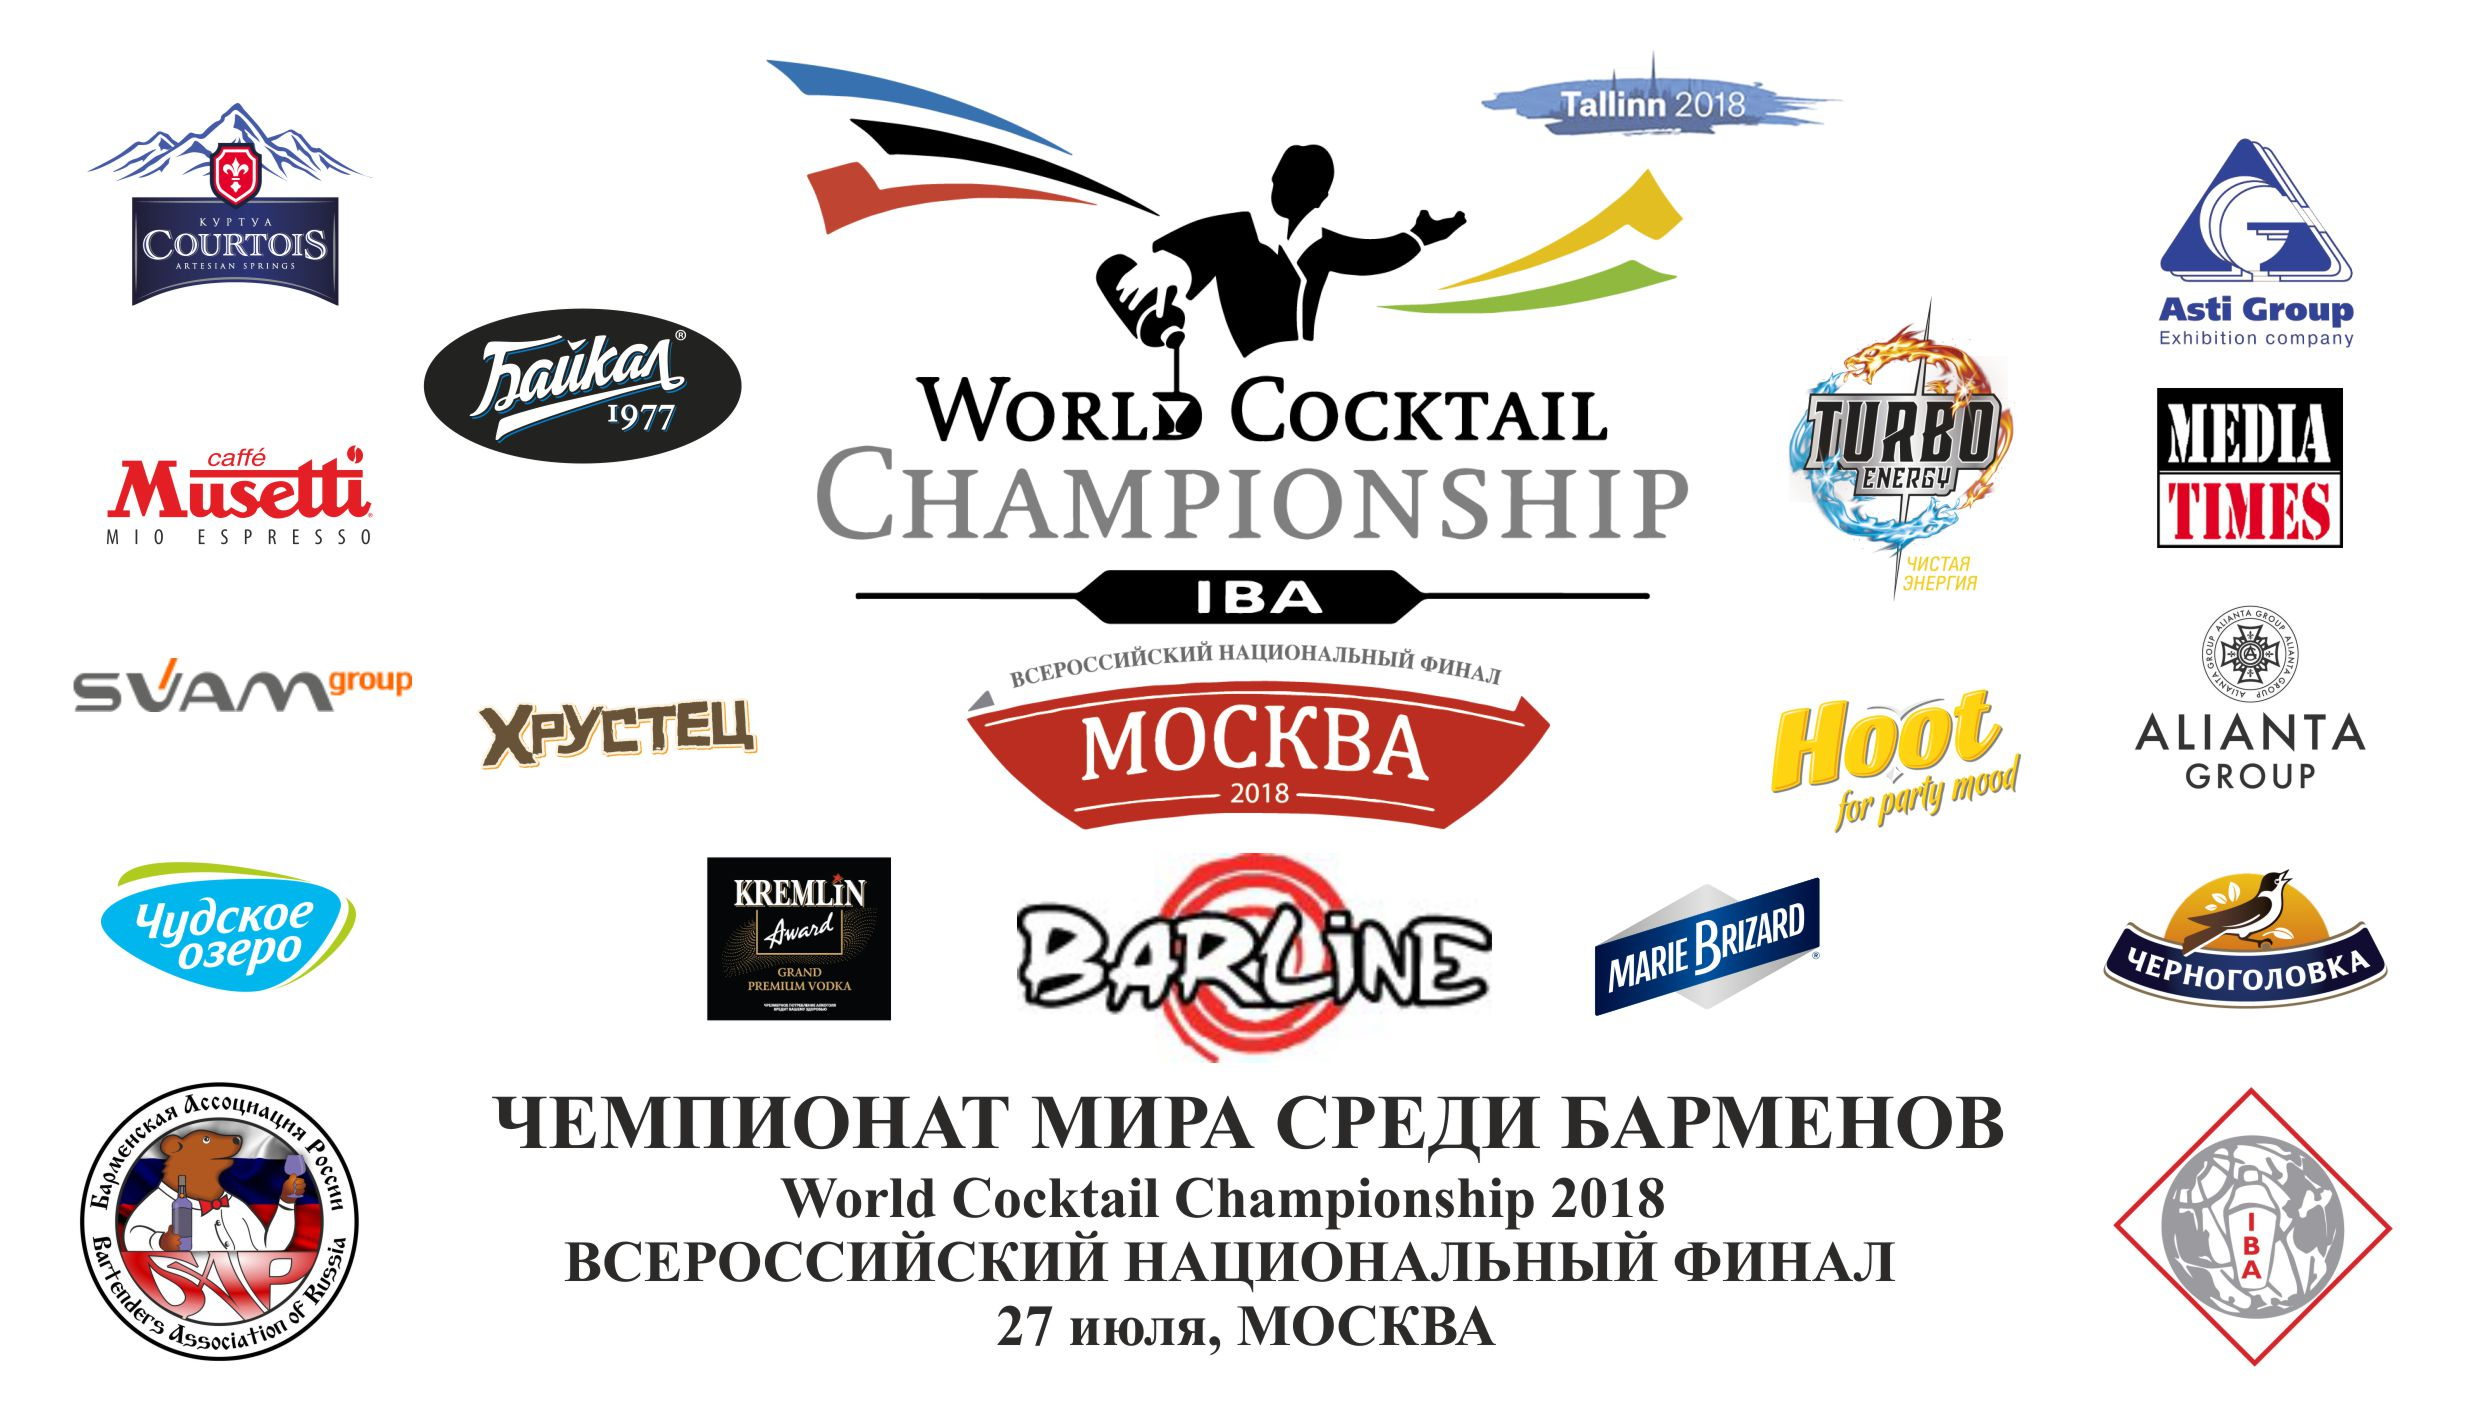 Афиша с логотипами Всероссийский финал WCC 2018 Москва 20.07.2018